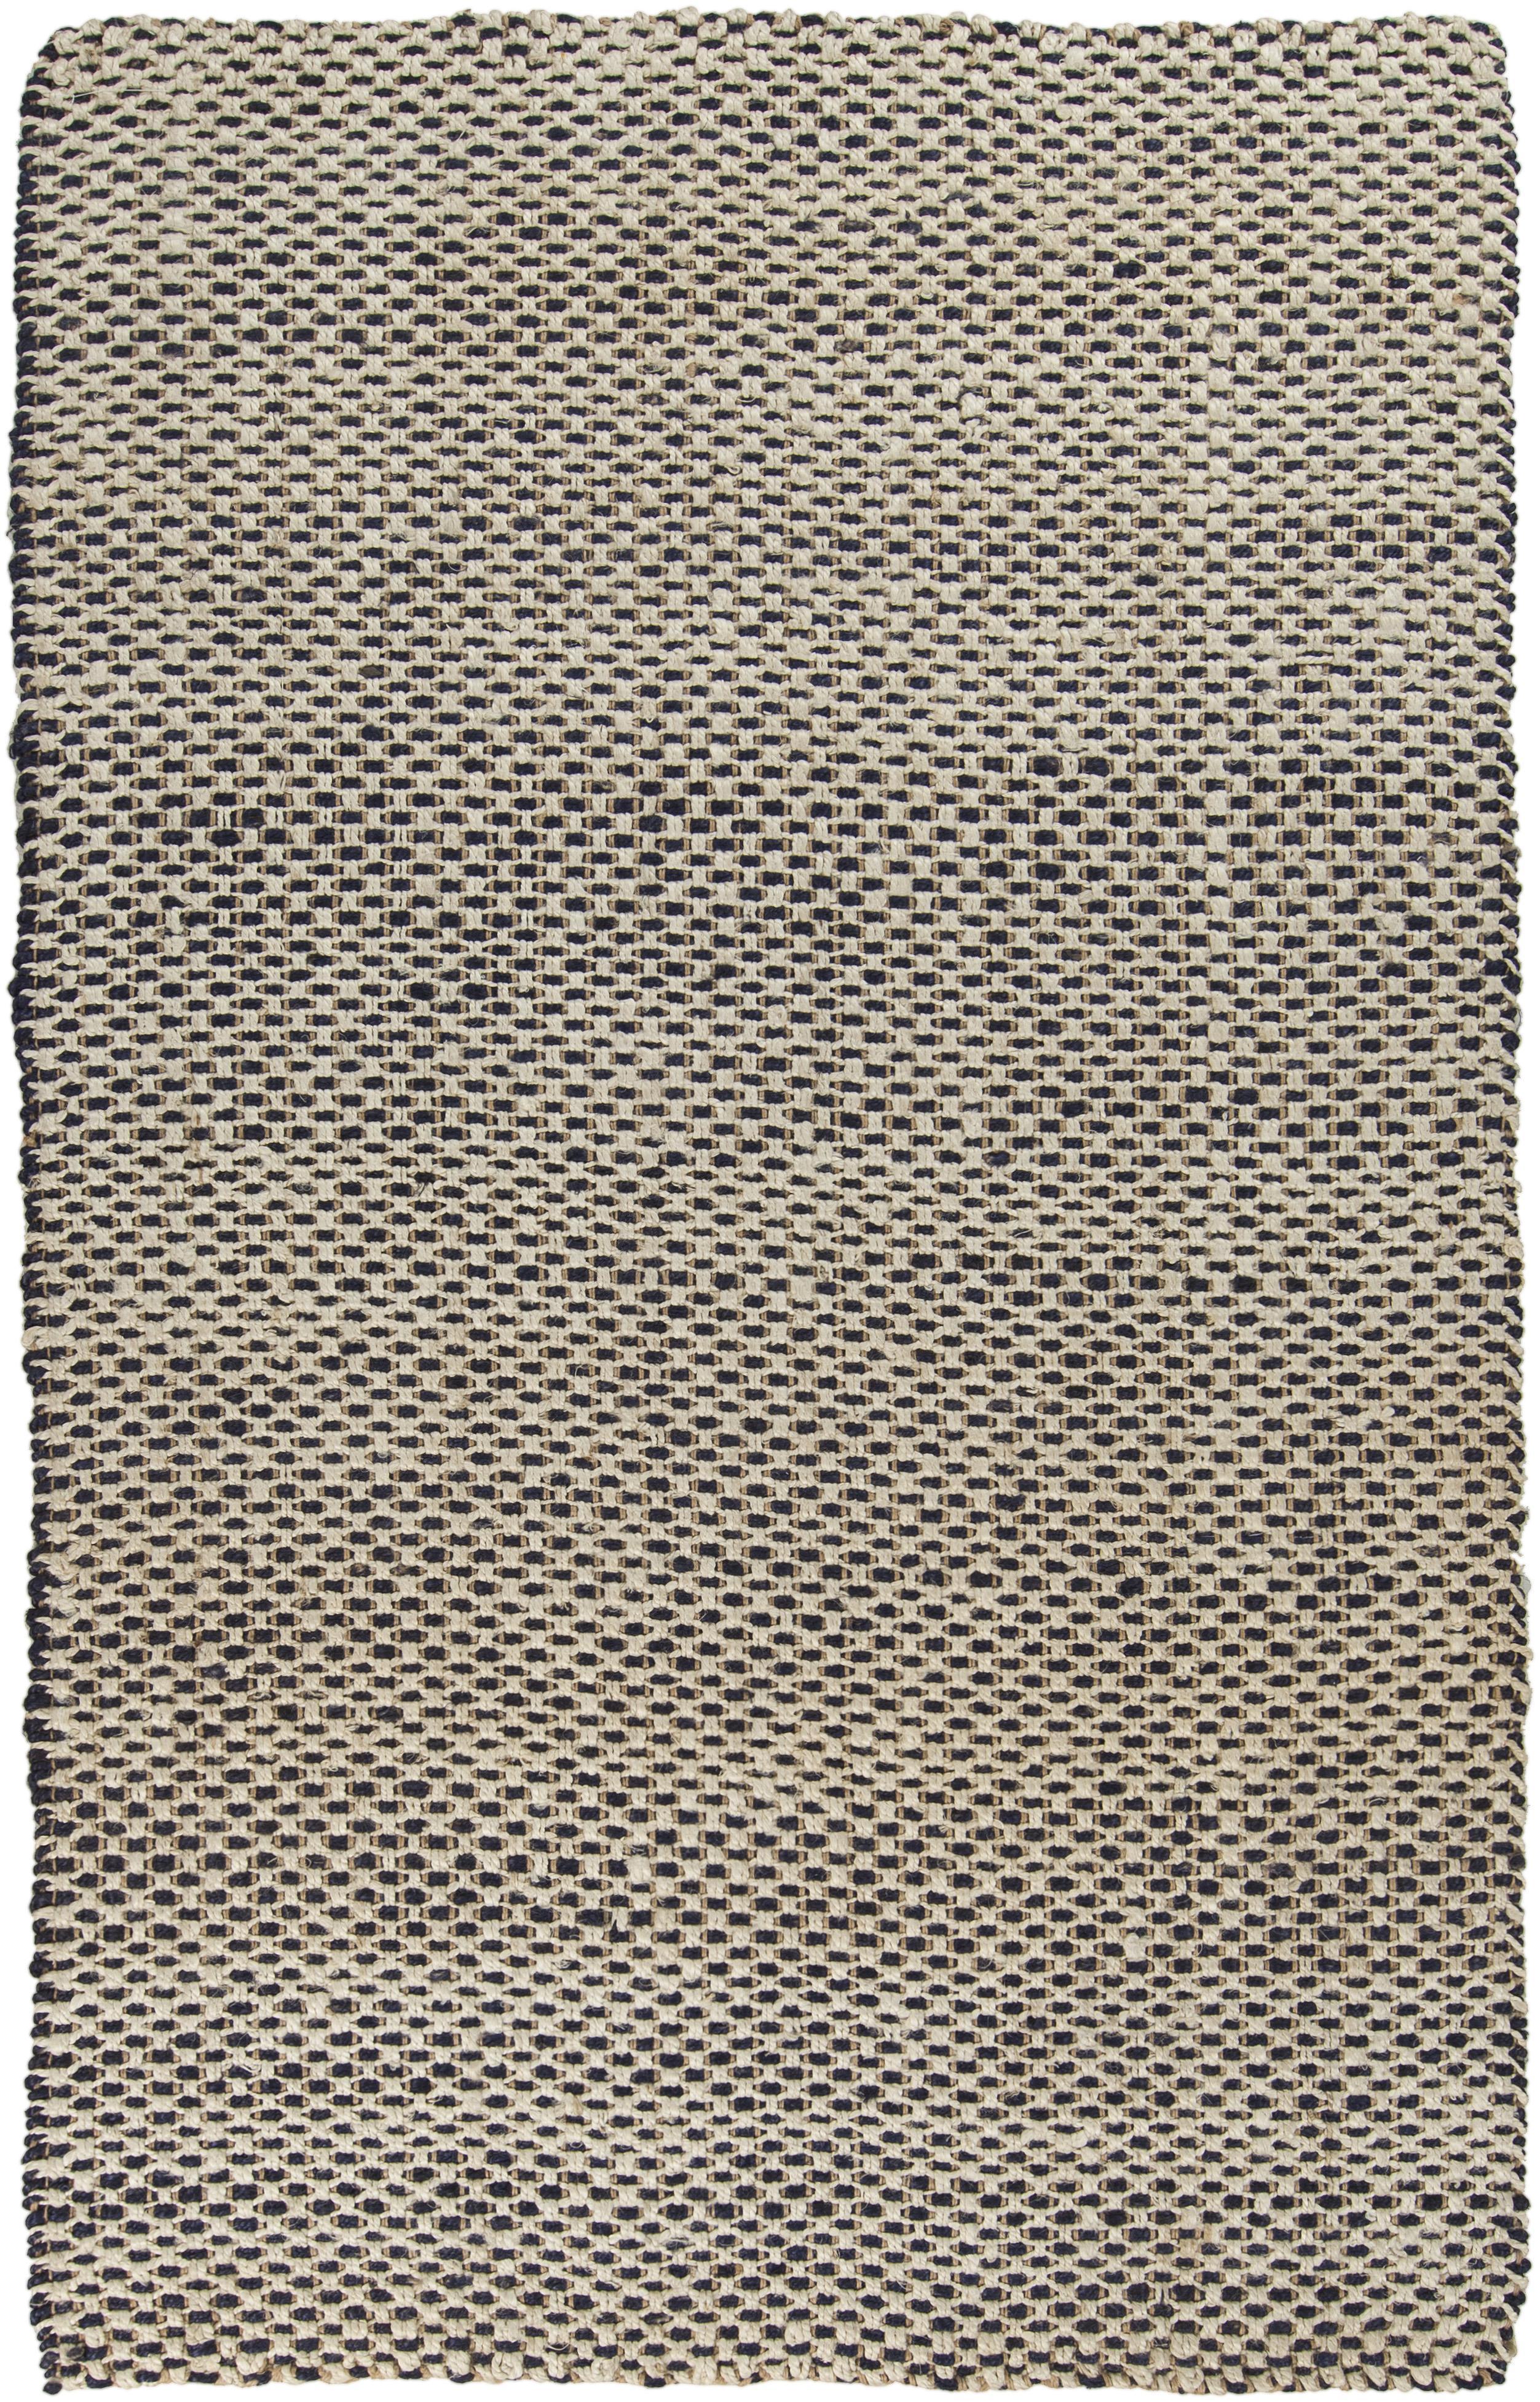 "Reeds 3'3"" x 5'3"" by 9596 at Becker Furniture"